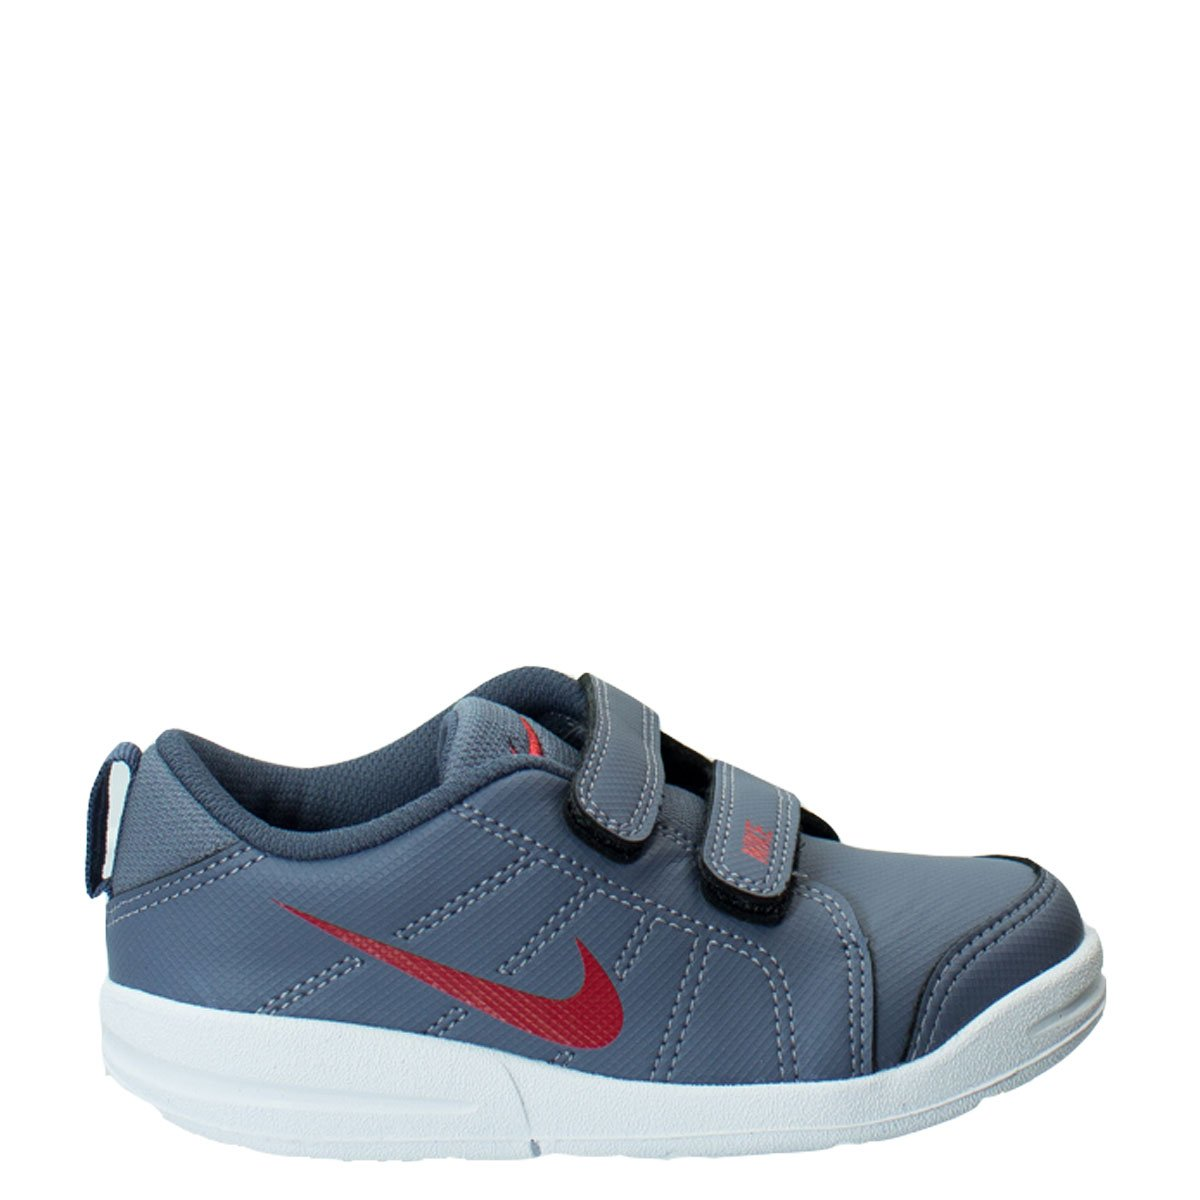 Bizz Store - Tênis Masculino Nike Pico LT Infantil 5236de89e476c